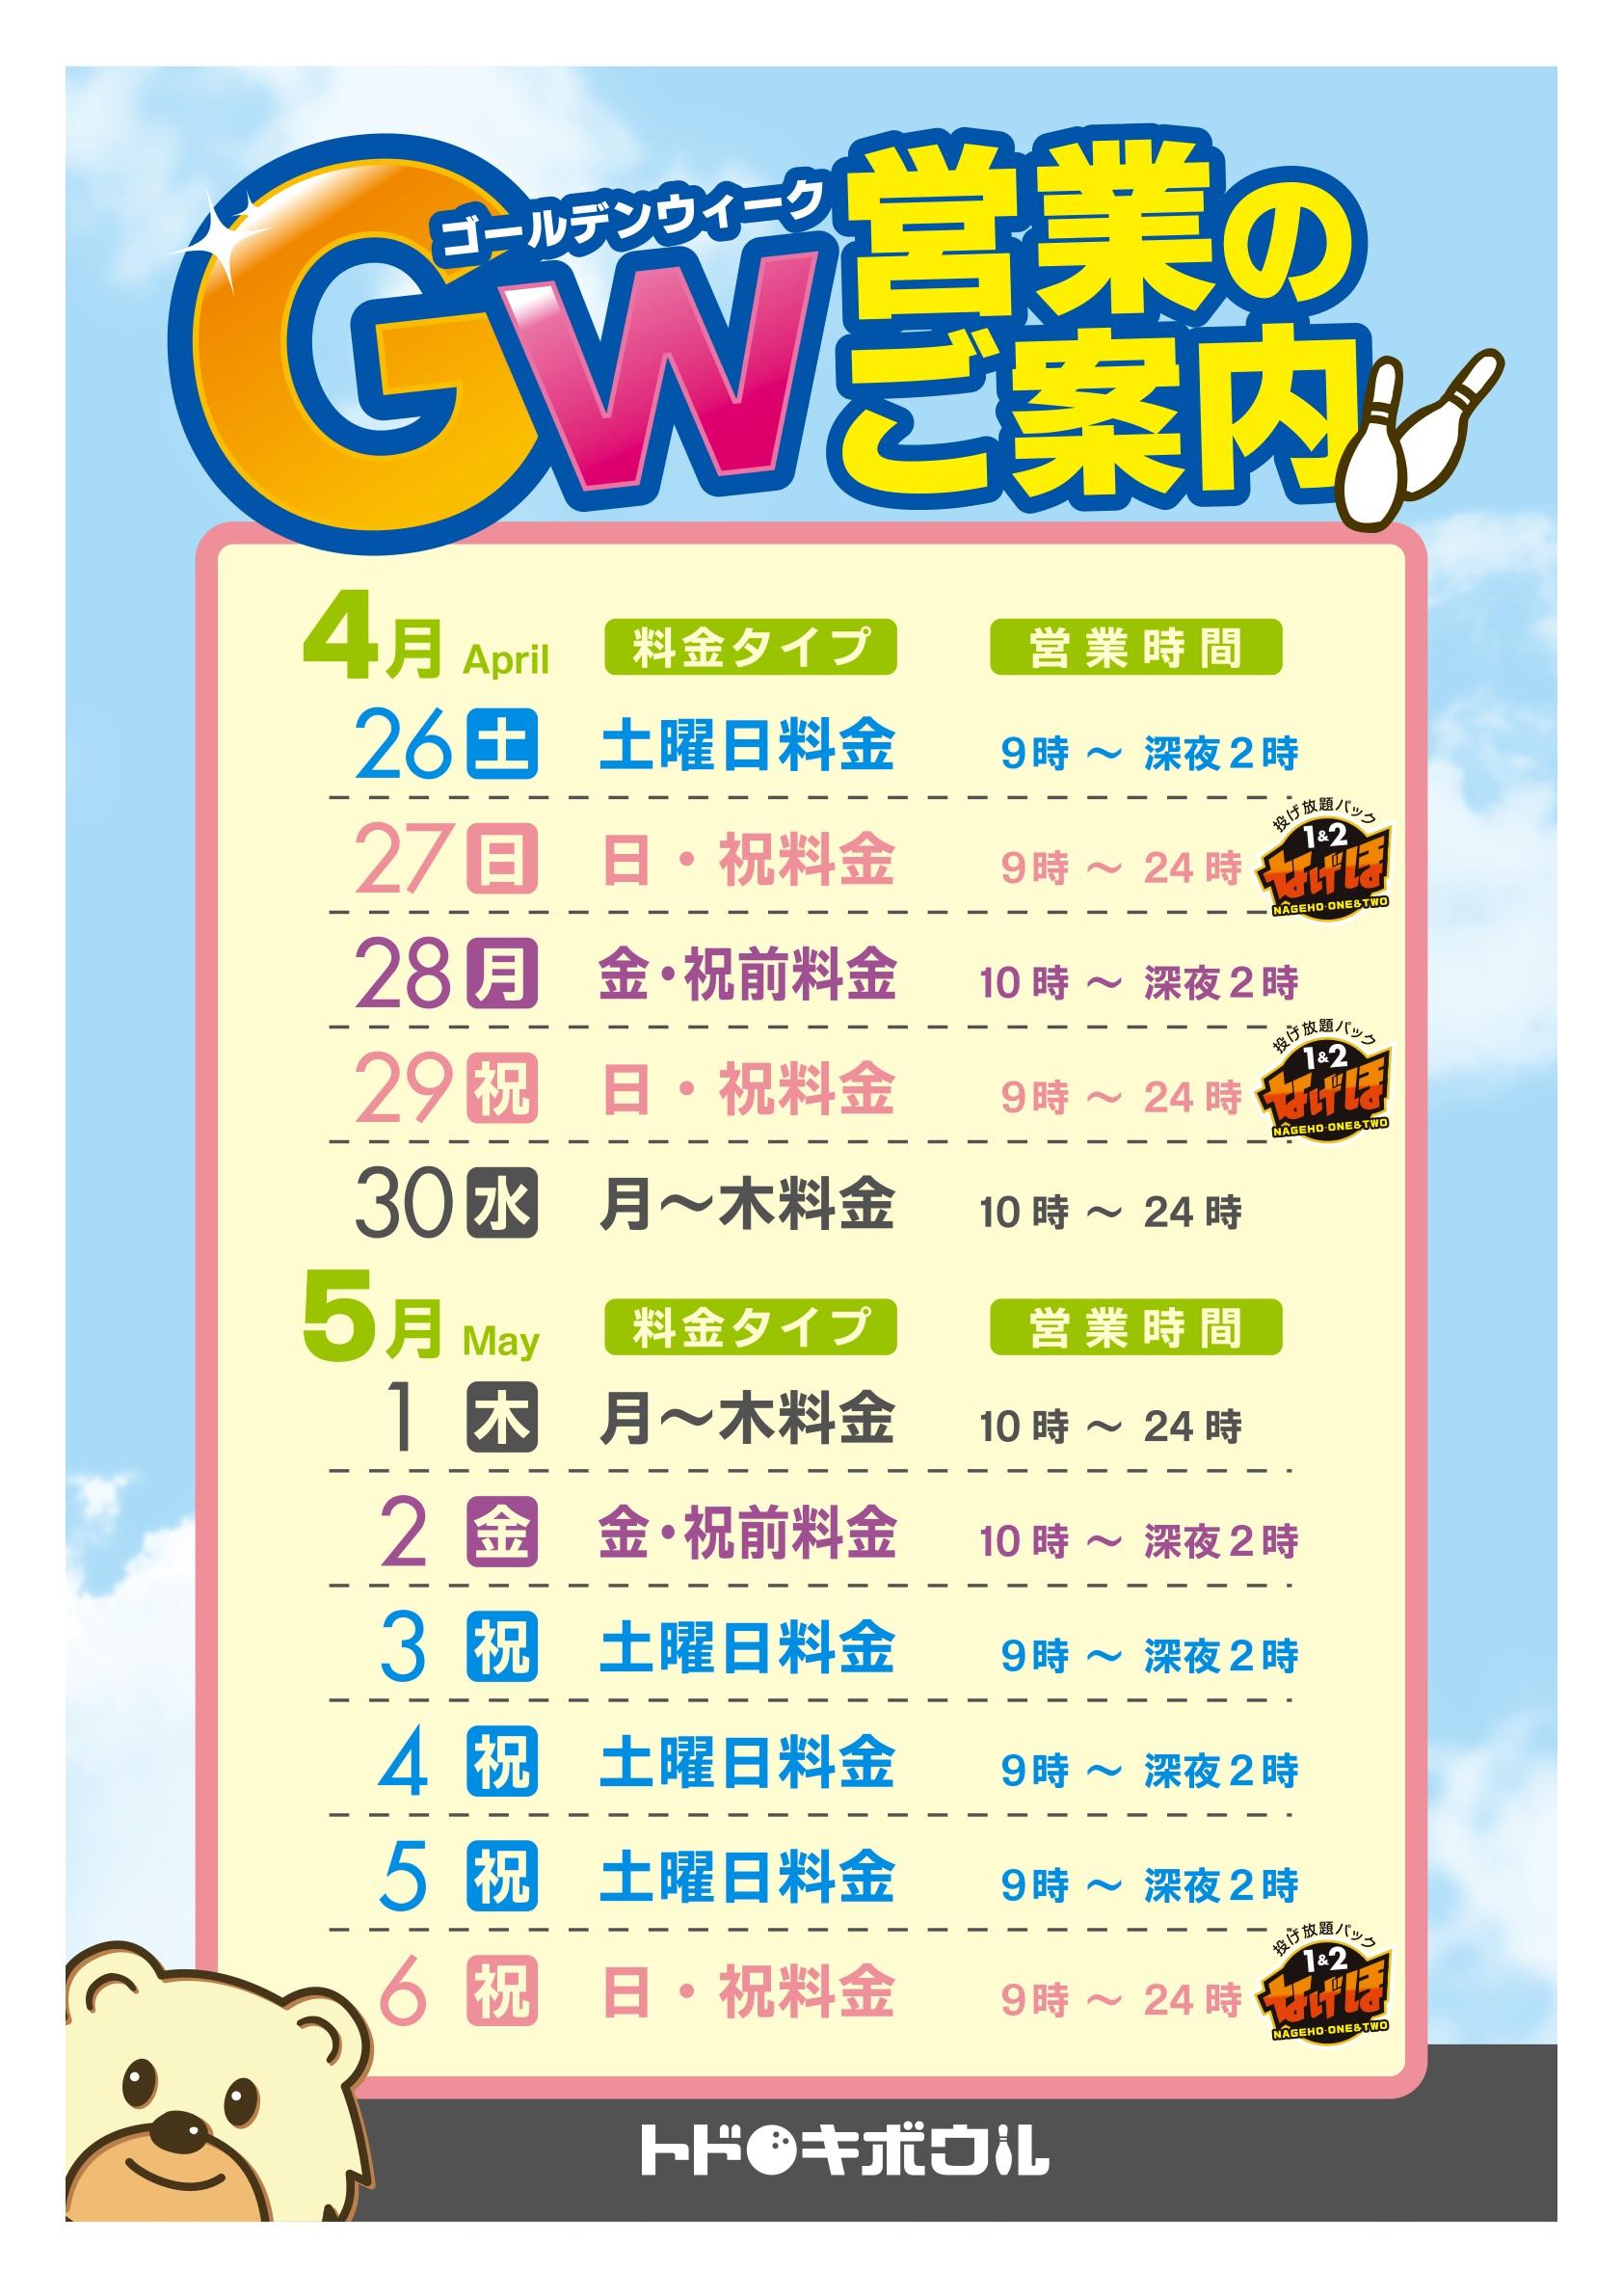 GW料金案内(TB)2